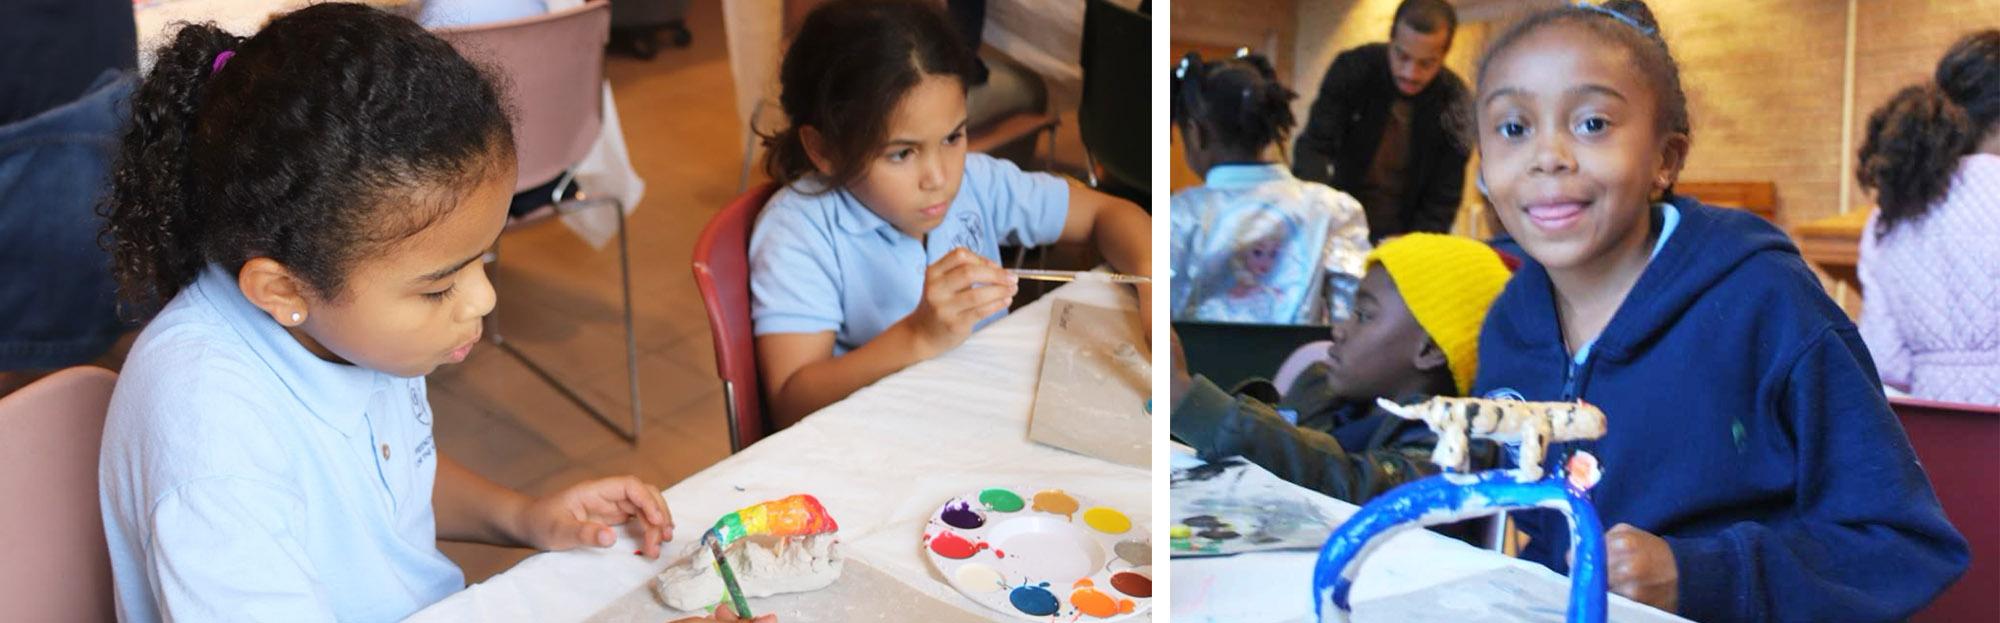 Students enjoying art projects